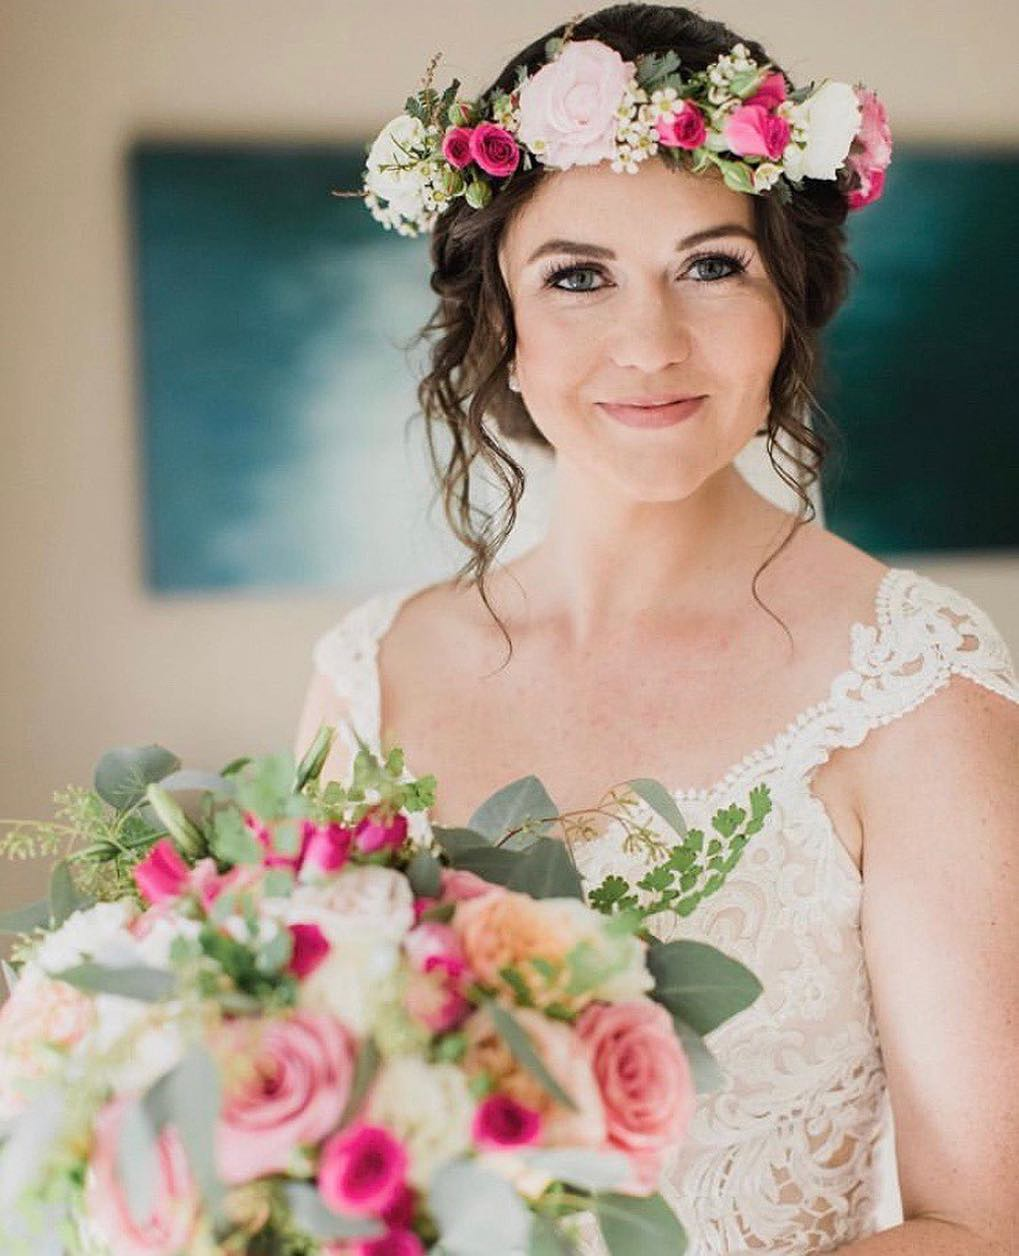 1 Well Travelled Bride Love and Beauty Maui Wedding Hair and Makeup Hawaii.jpg